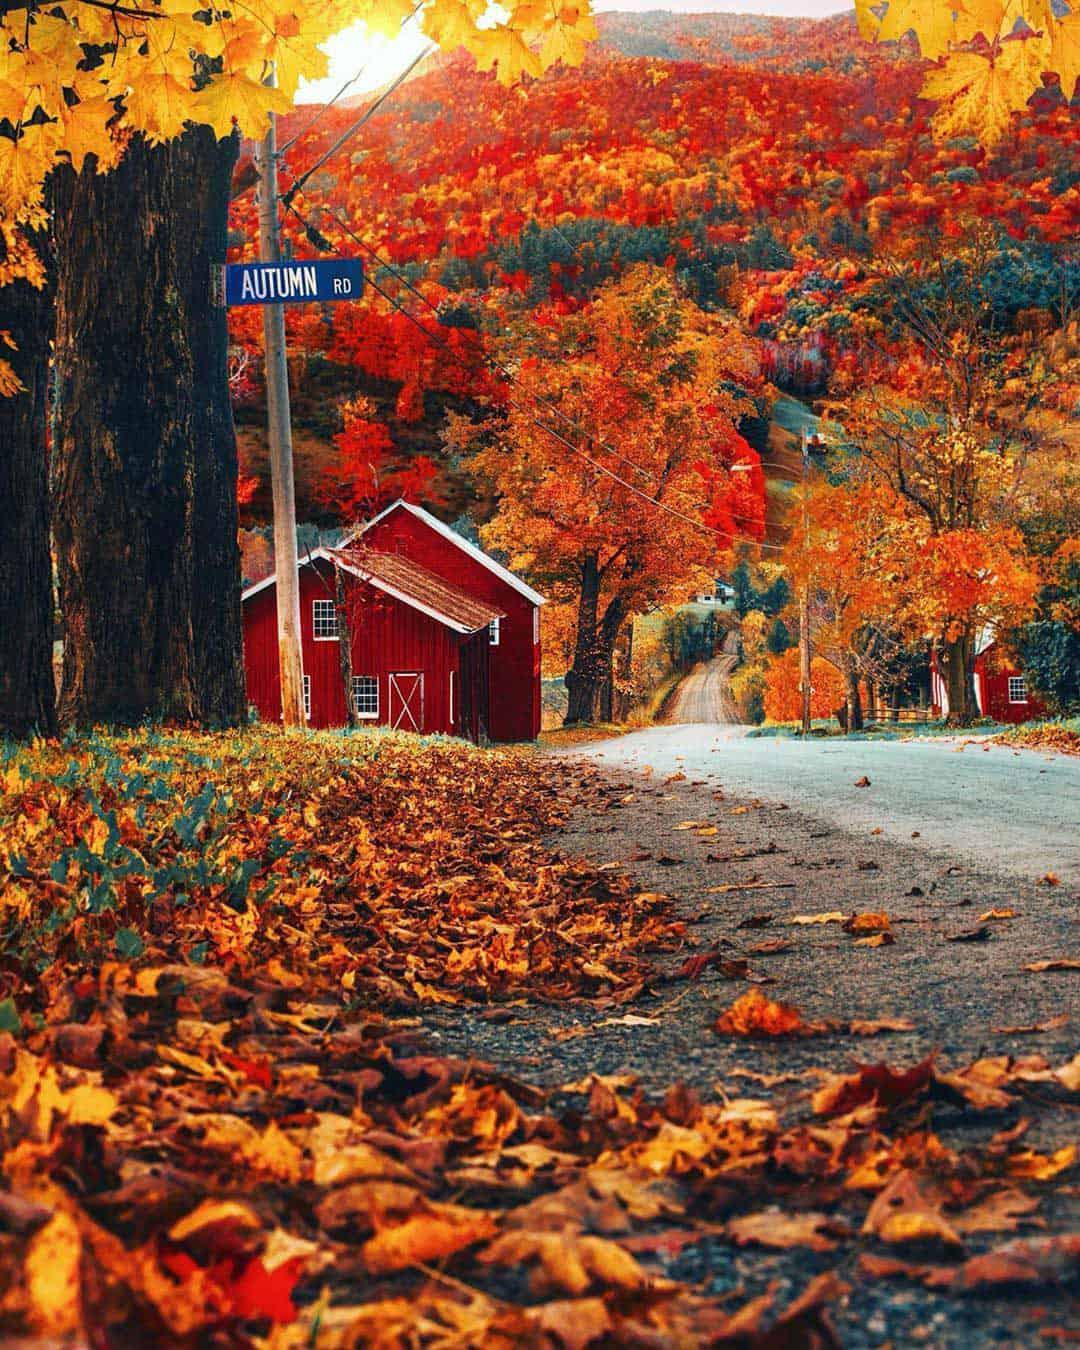 Photo of fall foliage.